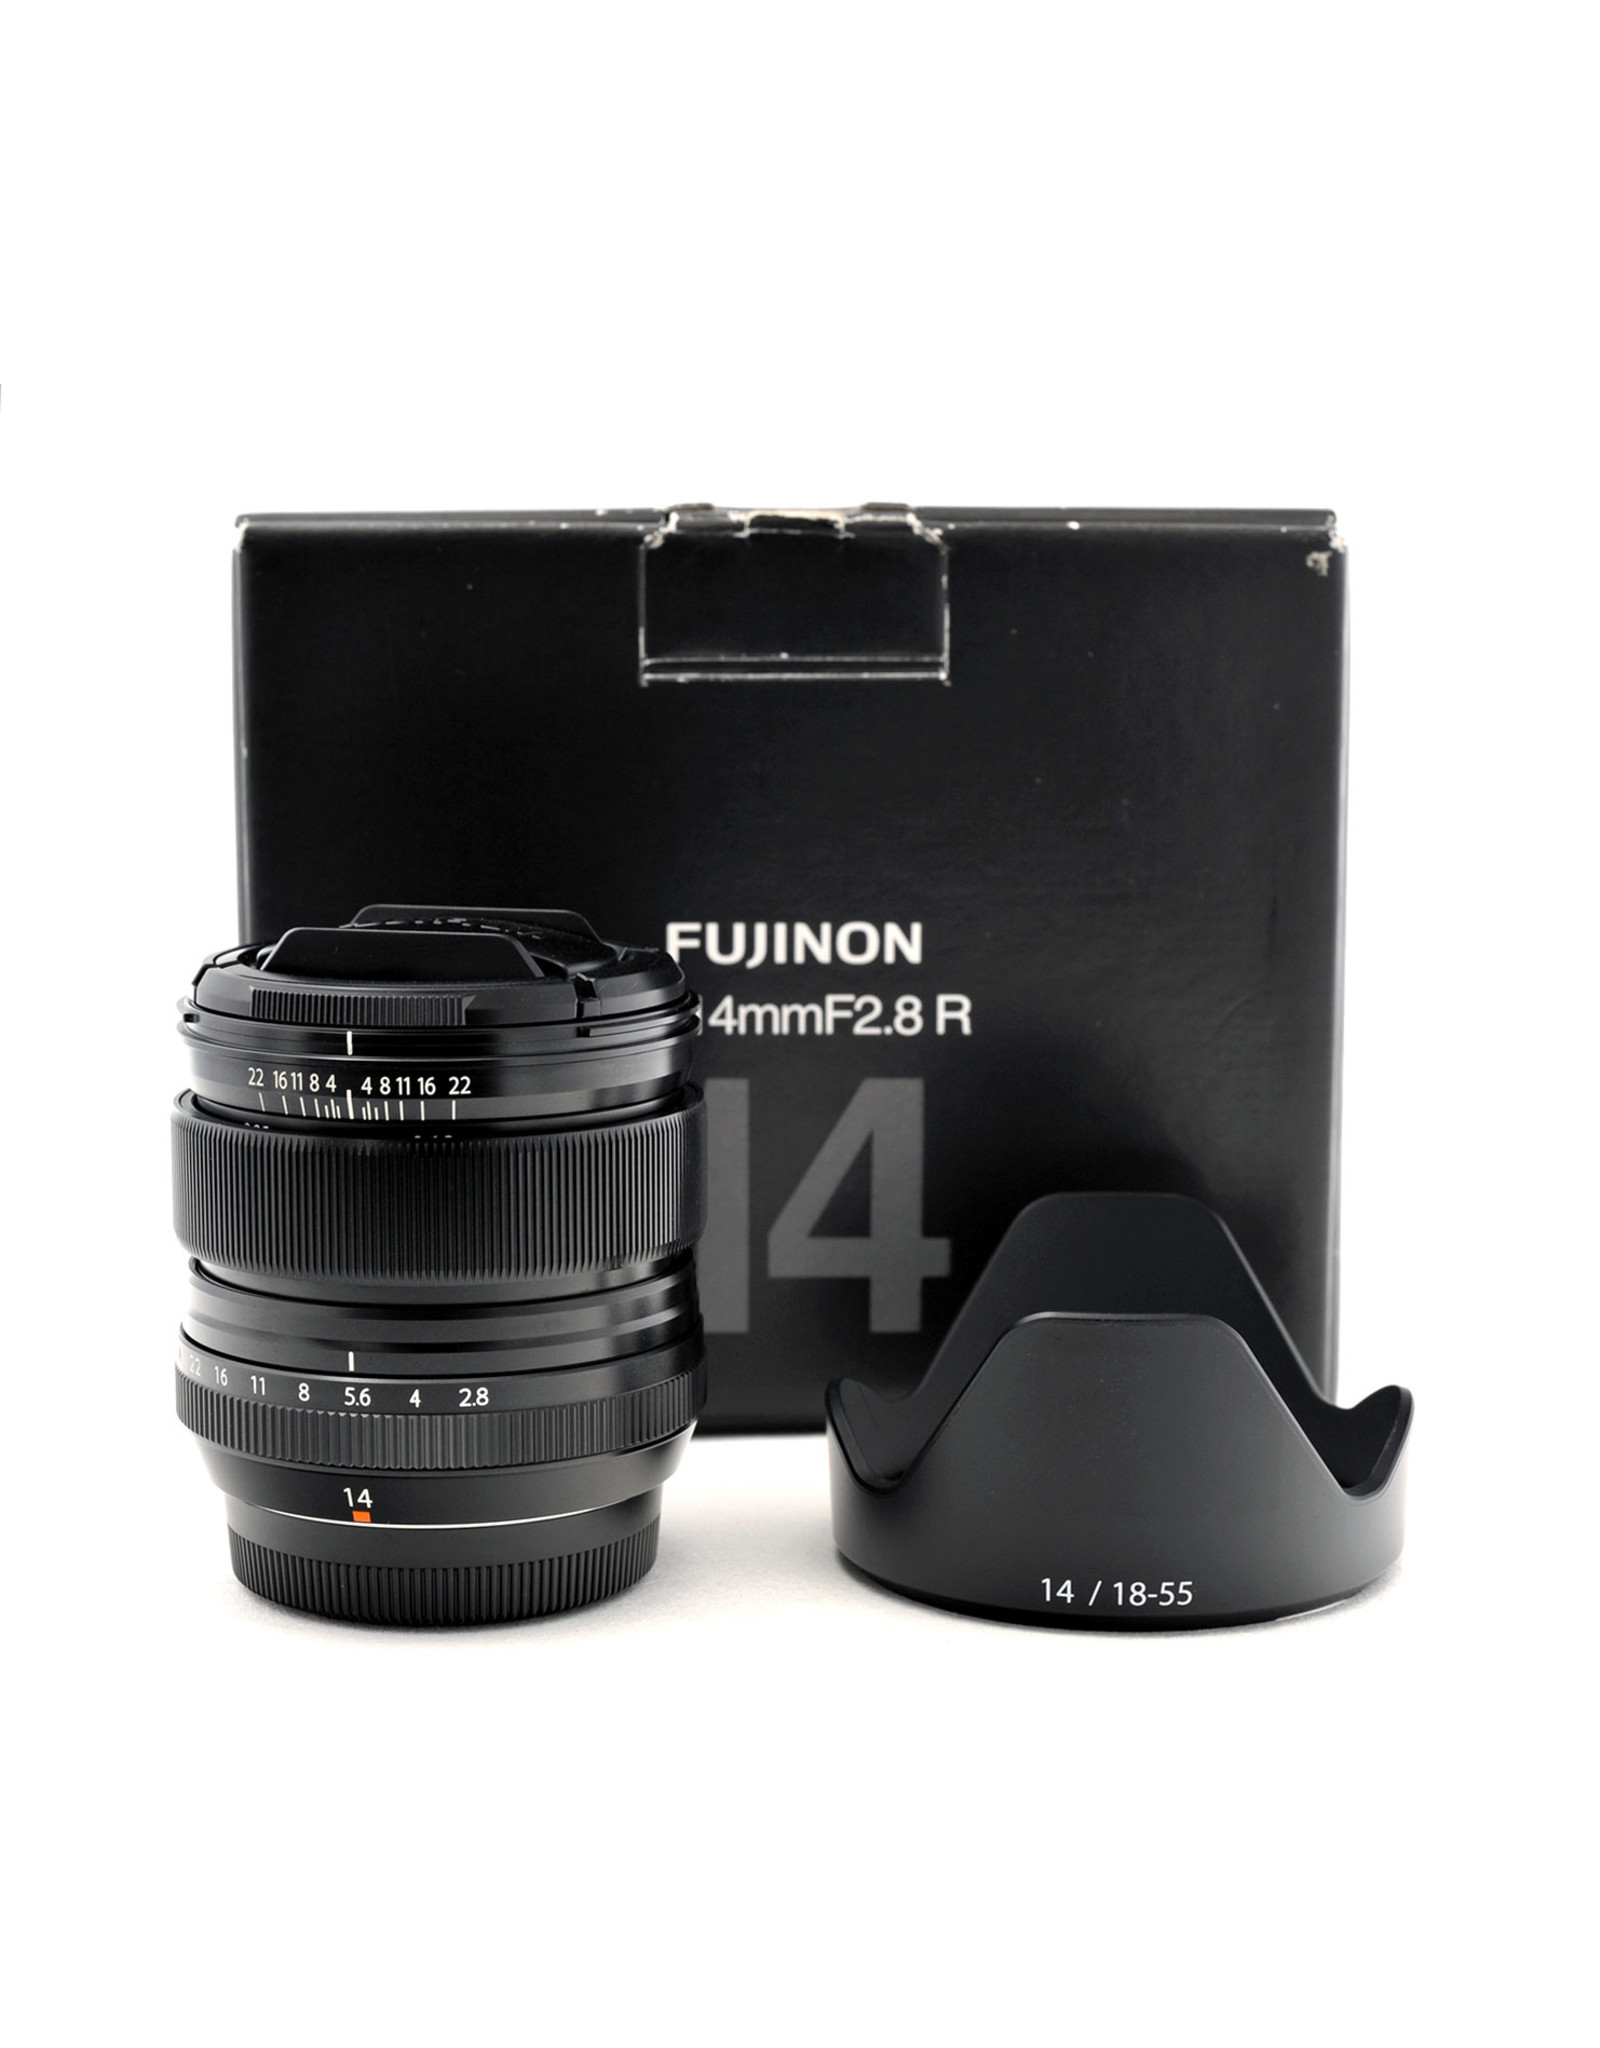 Fuji Fuji XF14mm f2.8 R   AP1052003